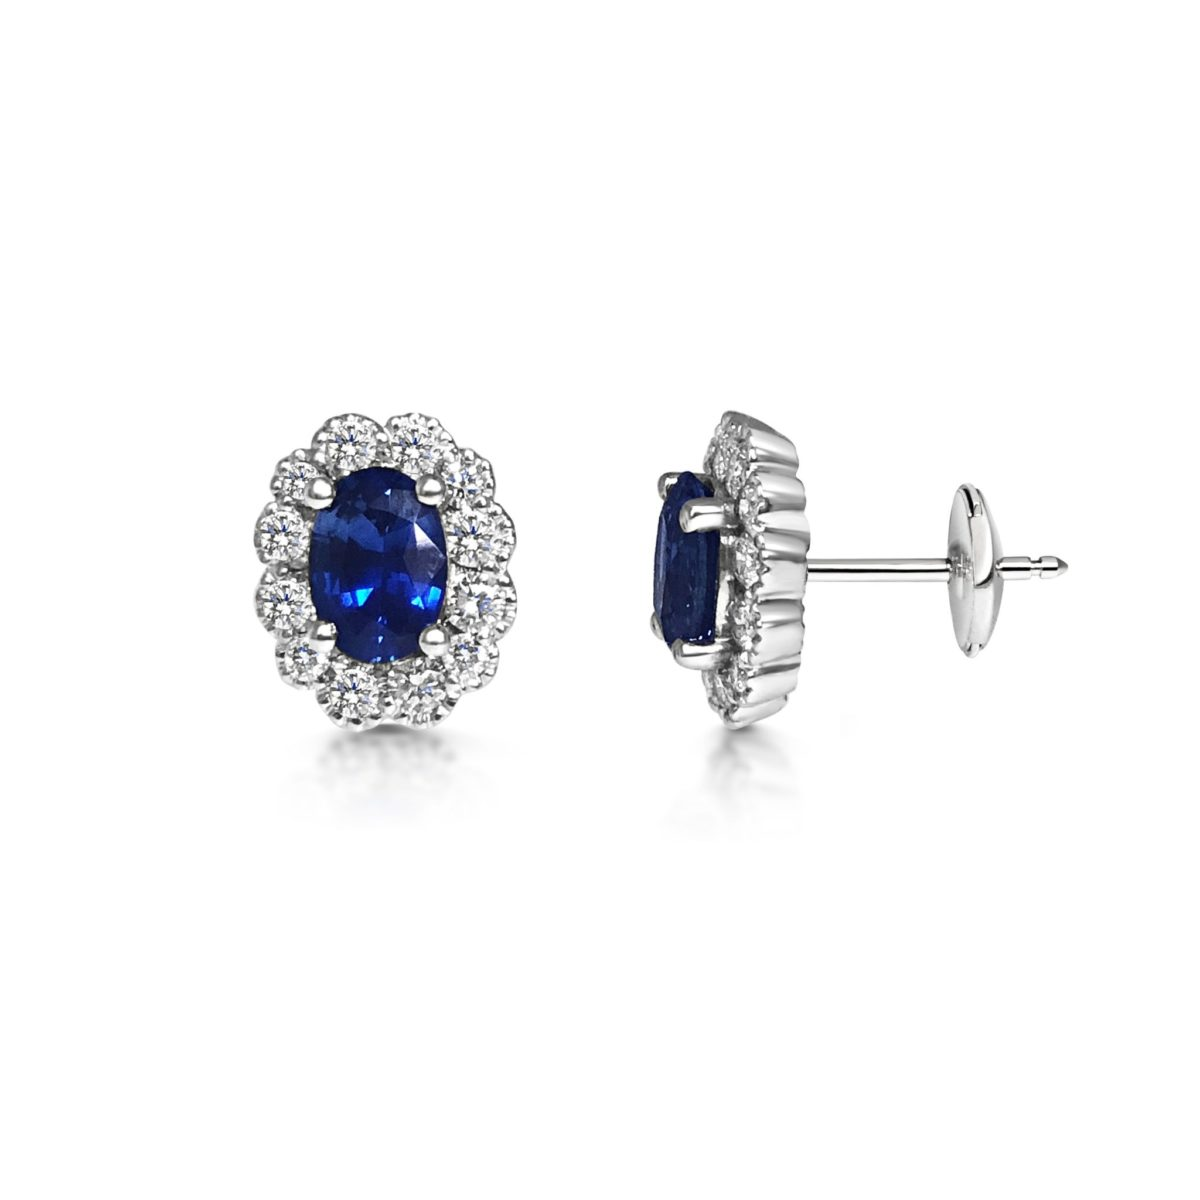 Seana Oval Cut Blue Sapphire & Diamond Halo Earrings